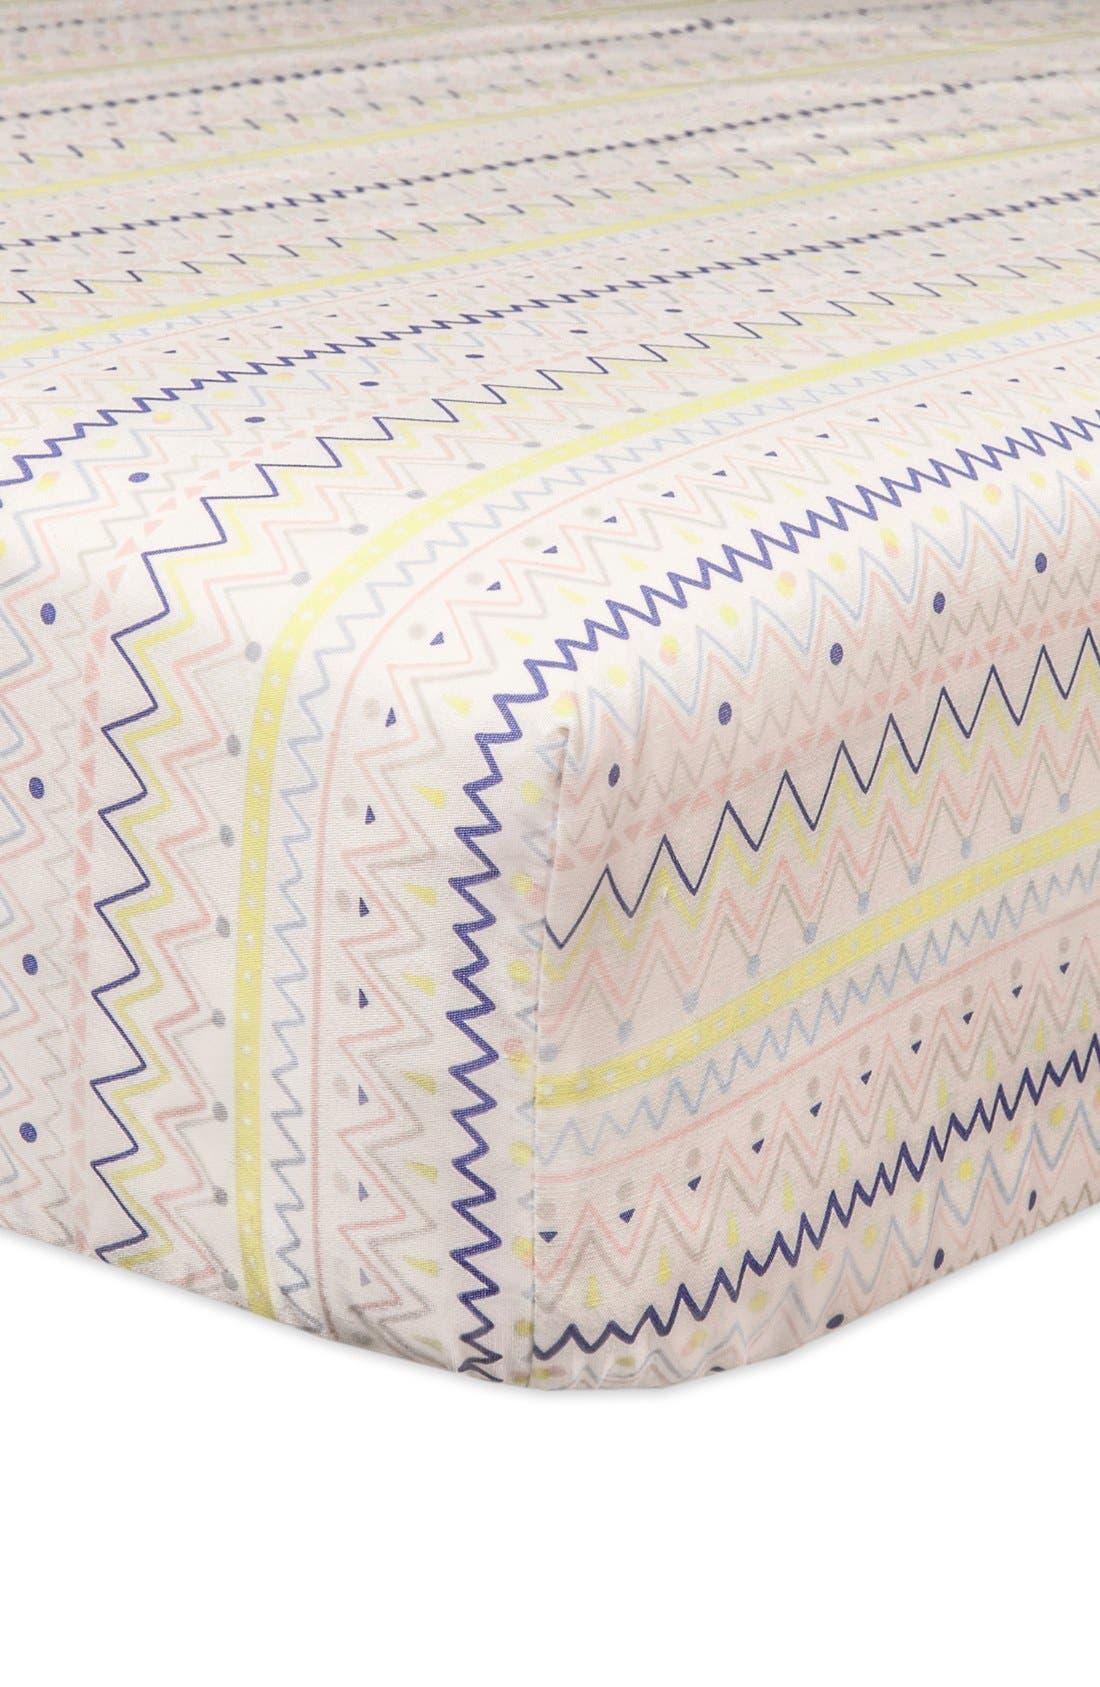 'Desert' Crib Sheet, Crib Skirt, Changing Pad Cover, Play Blanket, Stroller Blanket & Wall Decals,                             Alternate thumbnail 4, color,                             OFF WHITE